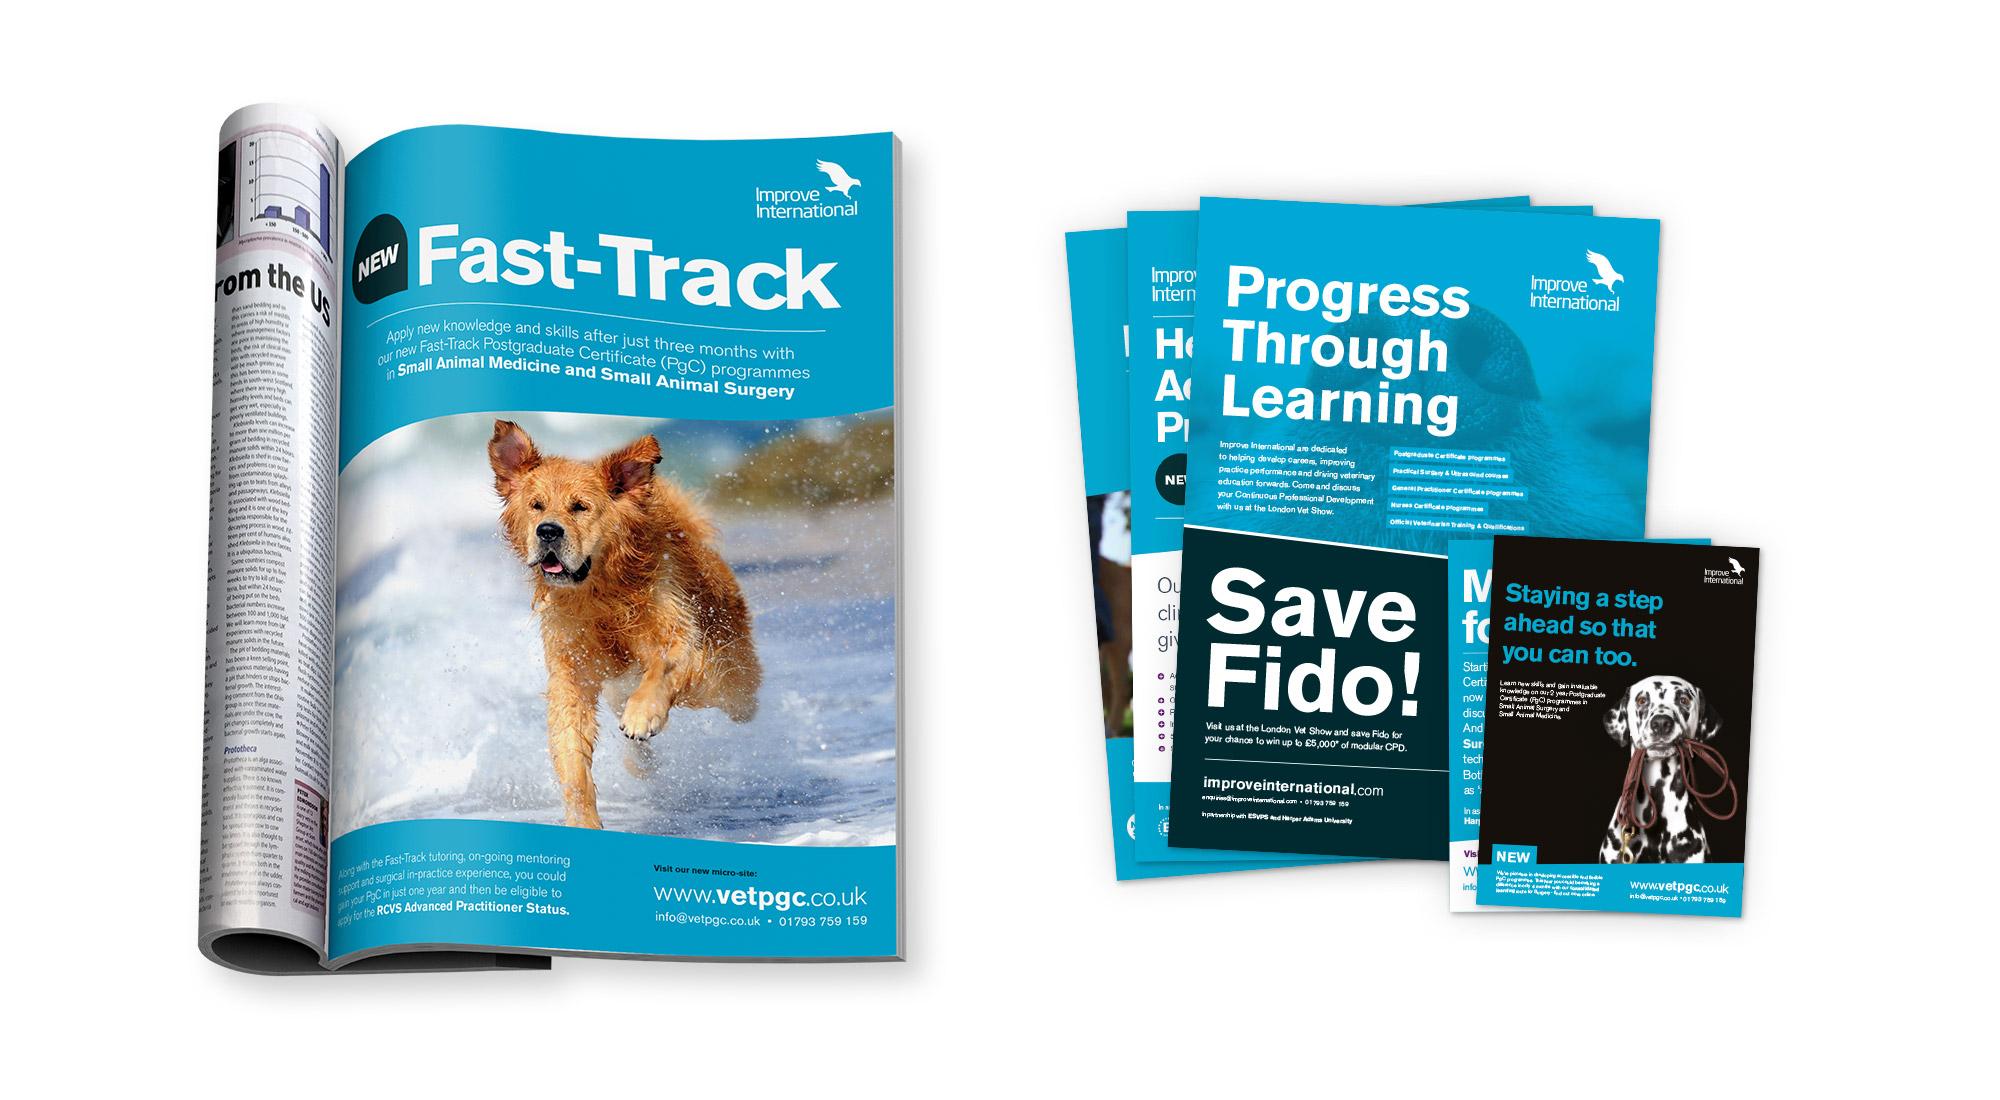 Advert design for veterinary media